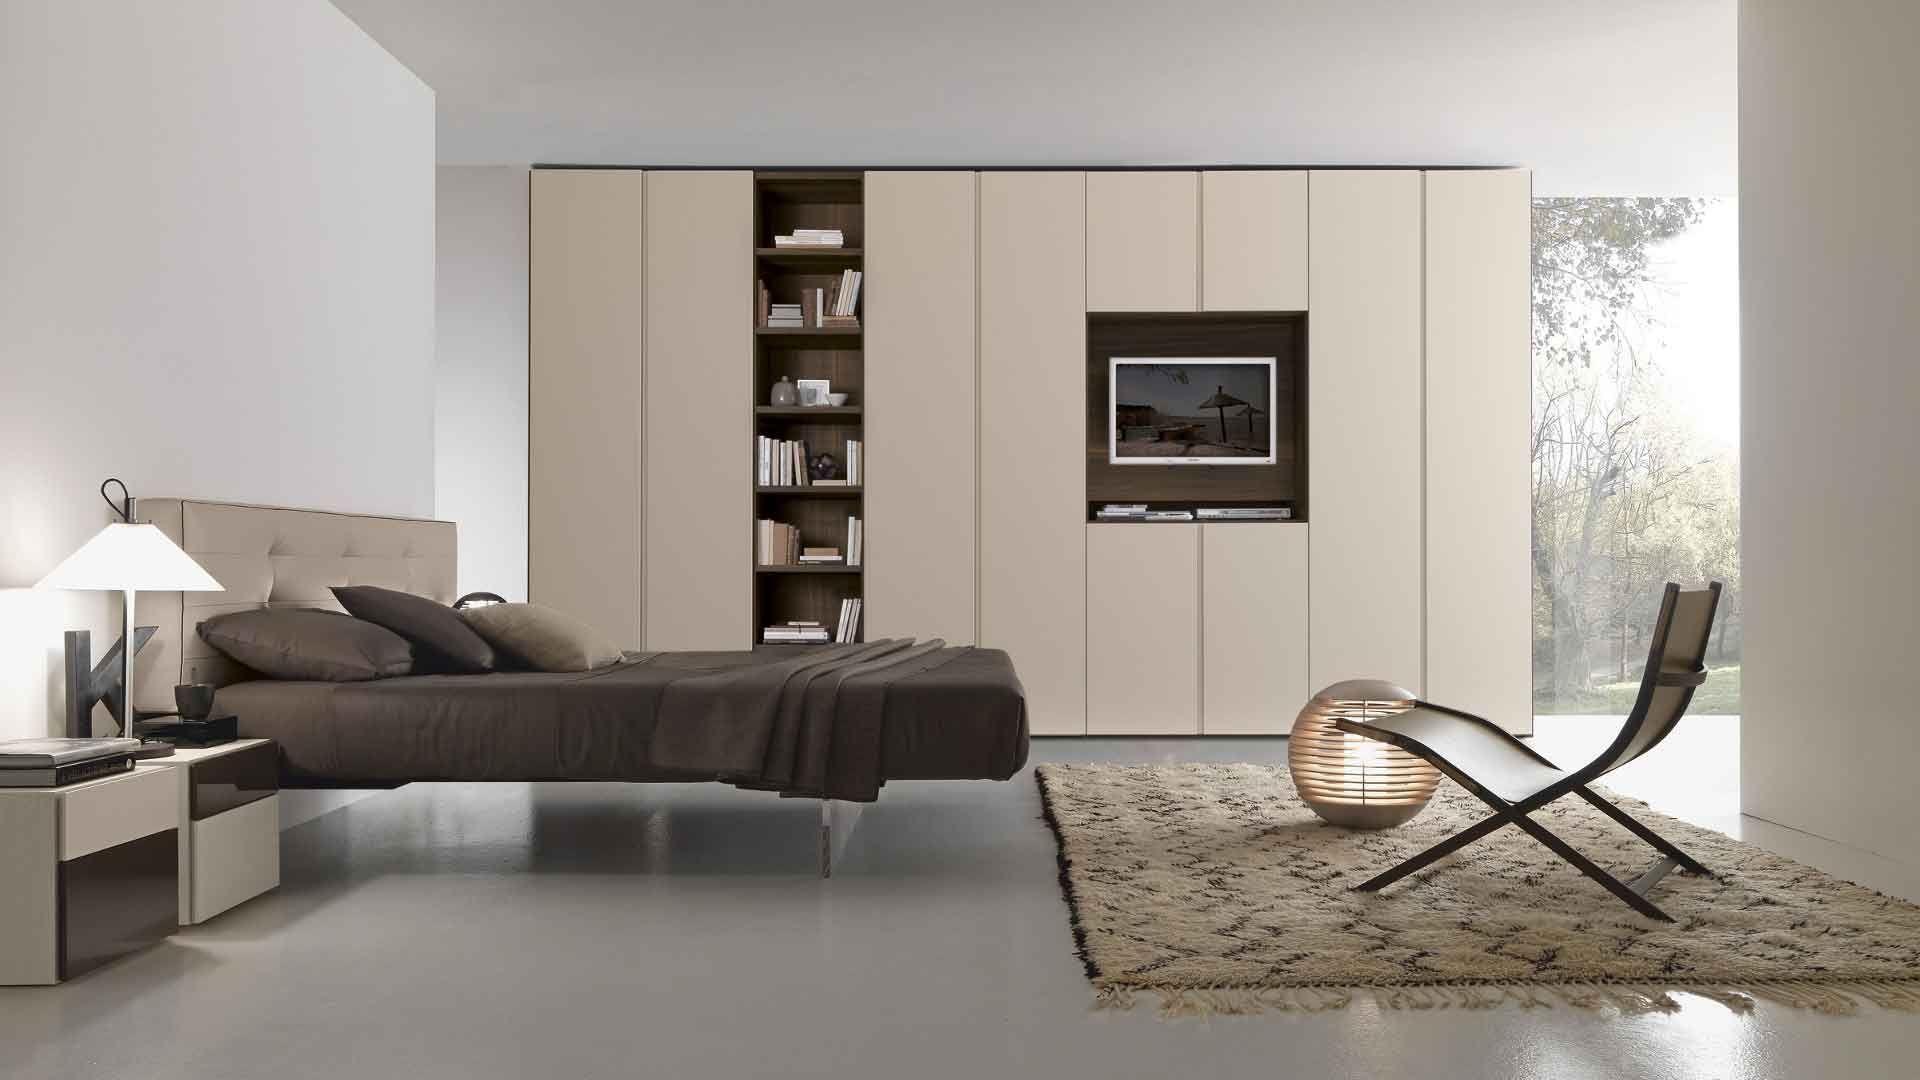 Pin di Patix Design su Wardrobes with hinged doors | Pinterest ...